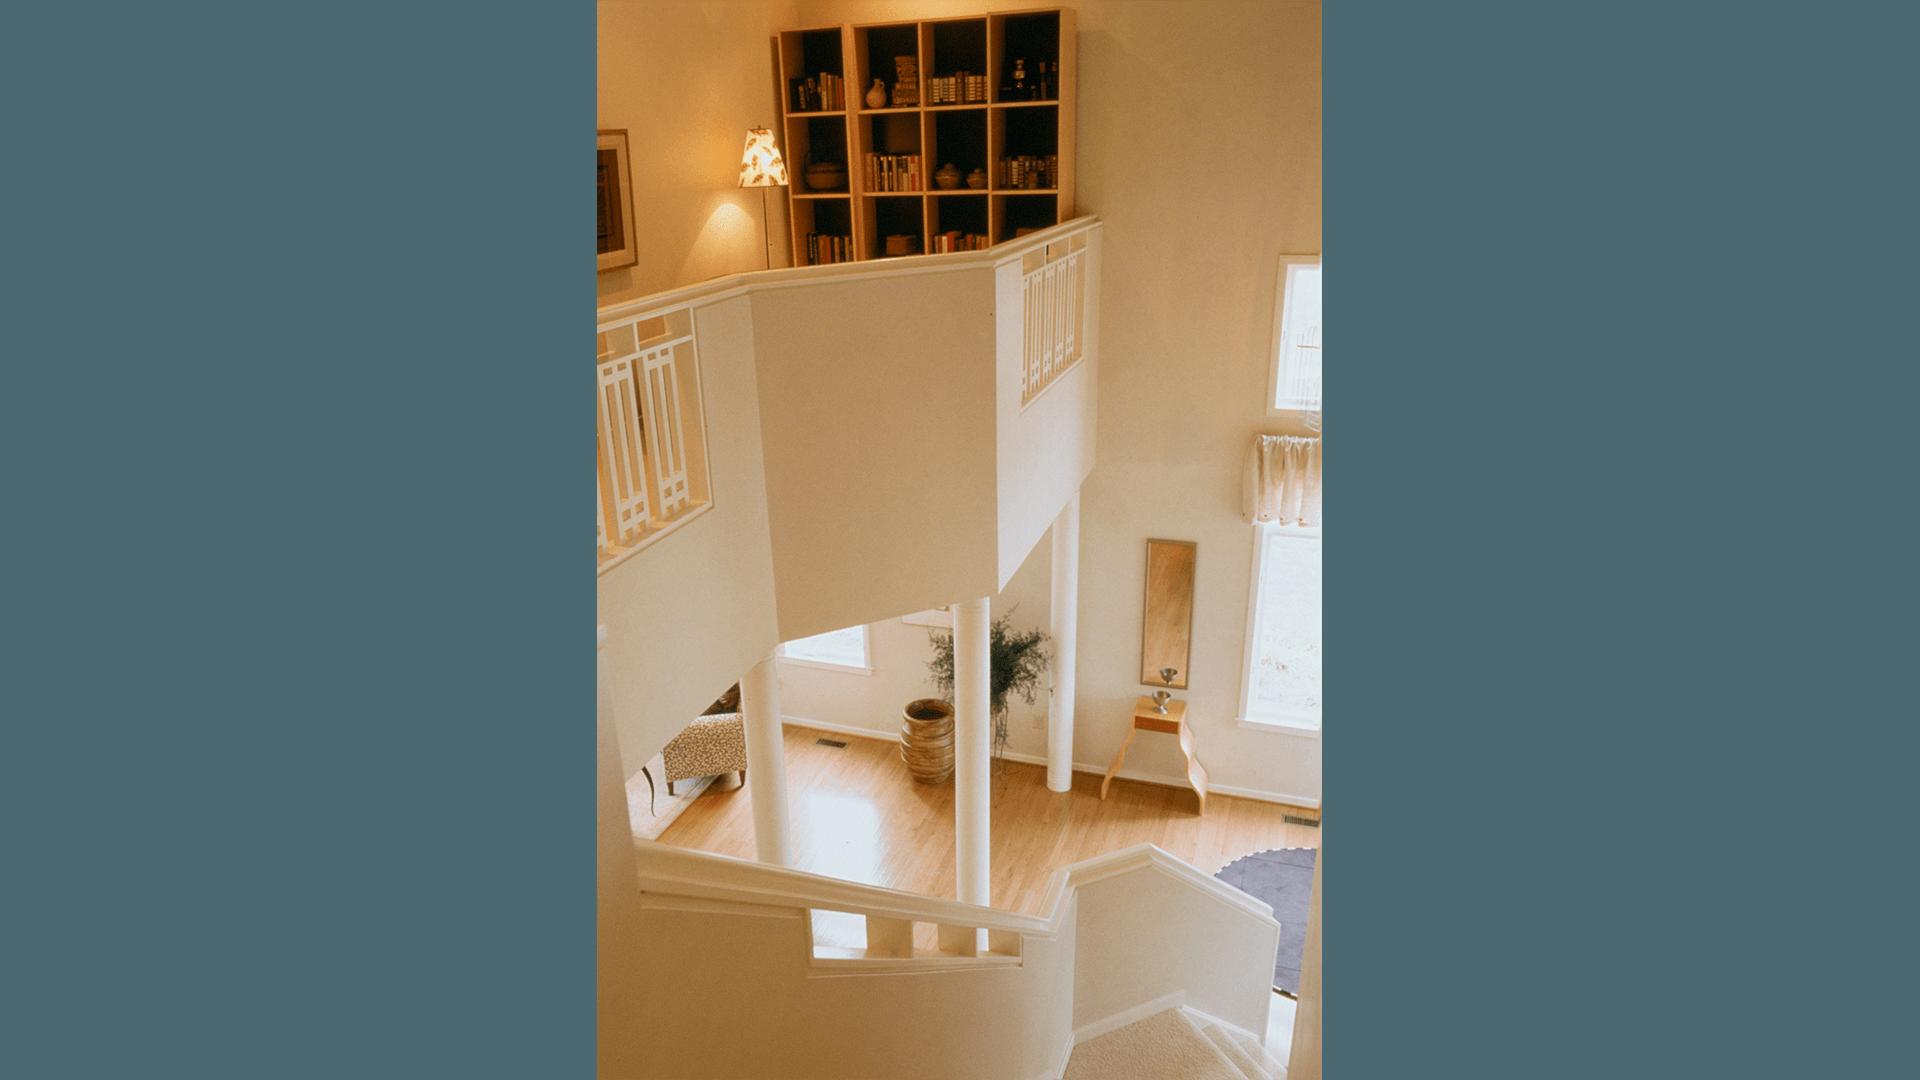 Family Room in Newport Shores